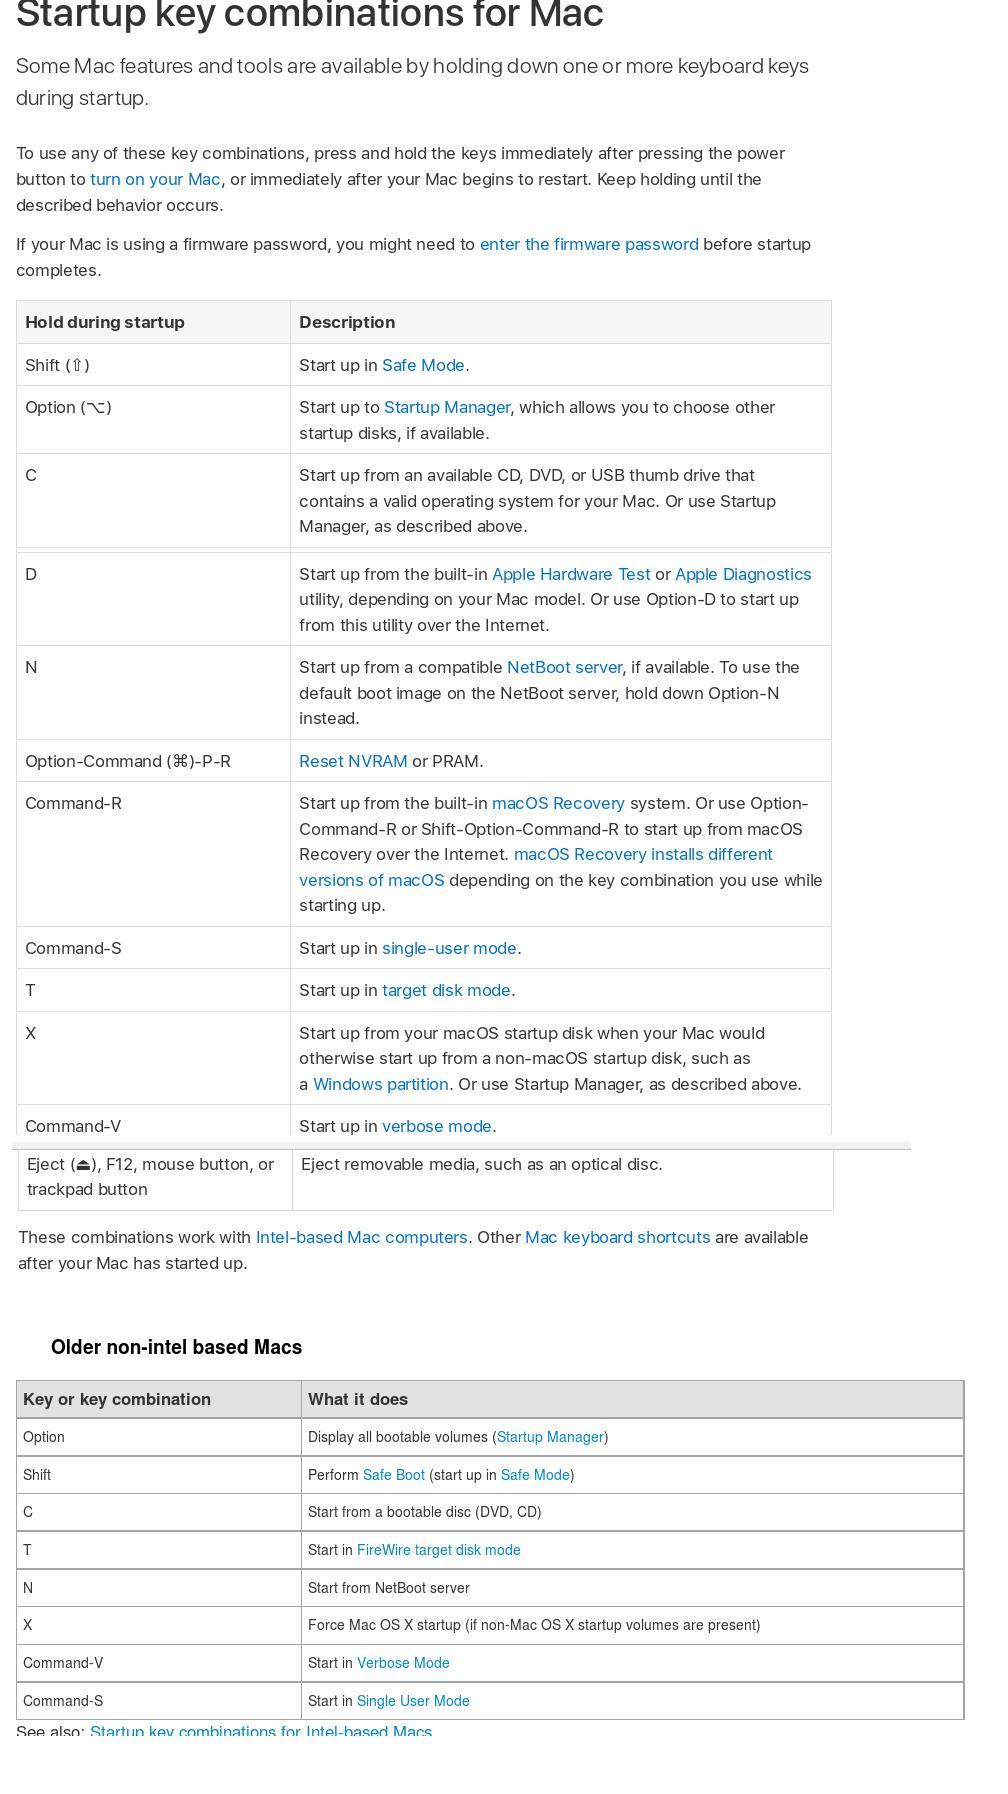 Apple/Mac/OSx info